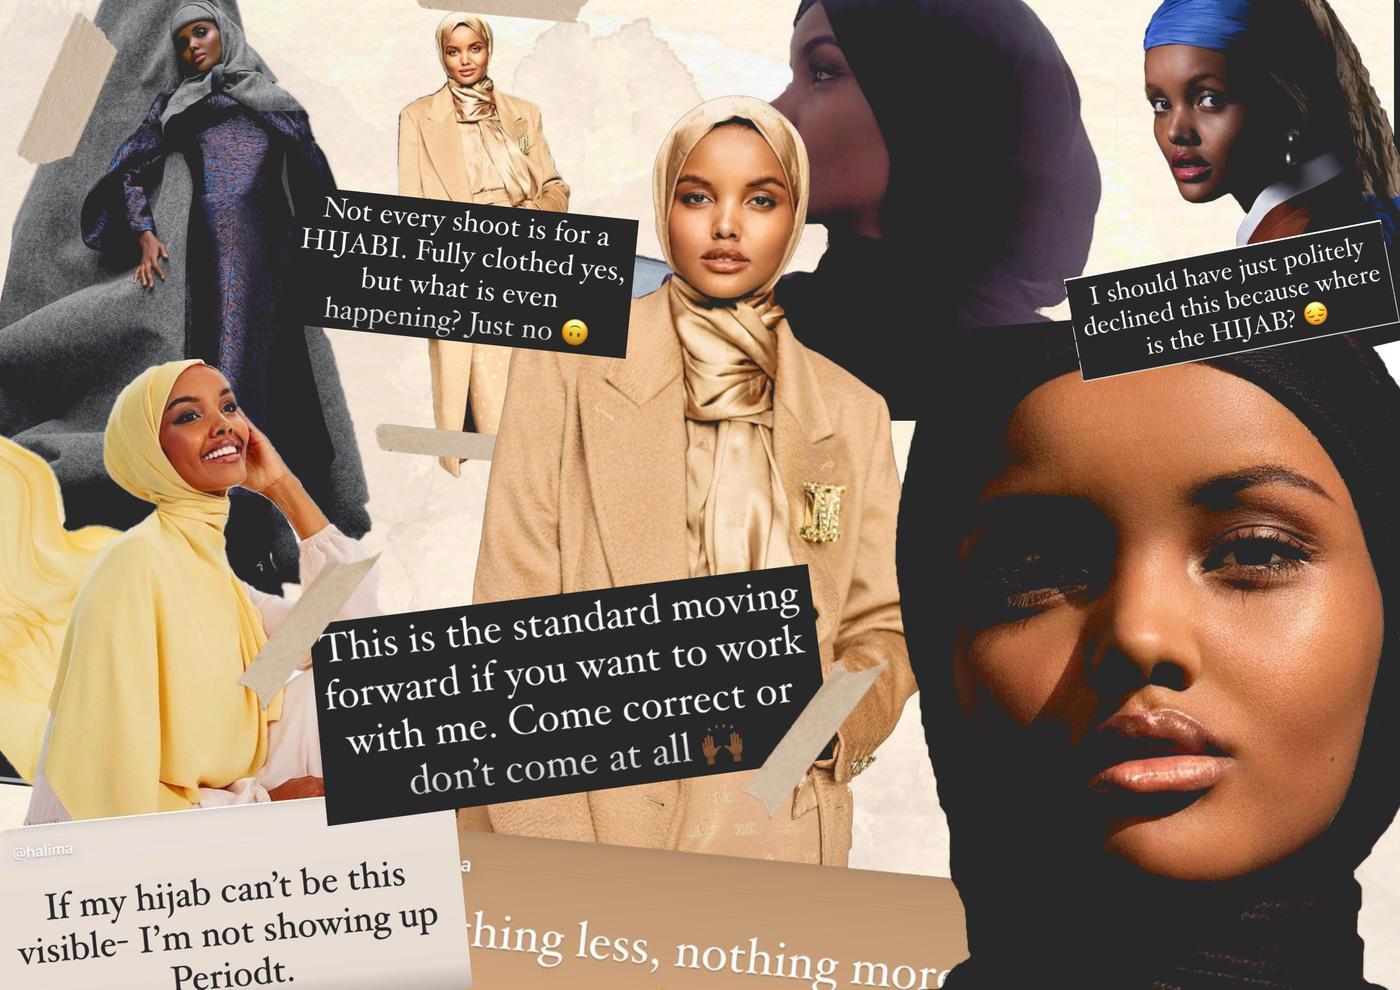 Muslim model Halima Aden quits fashion industry